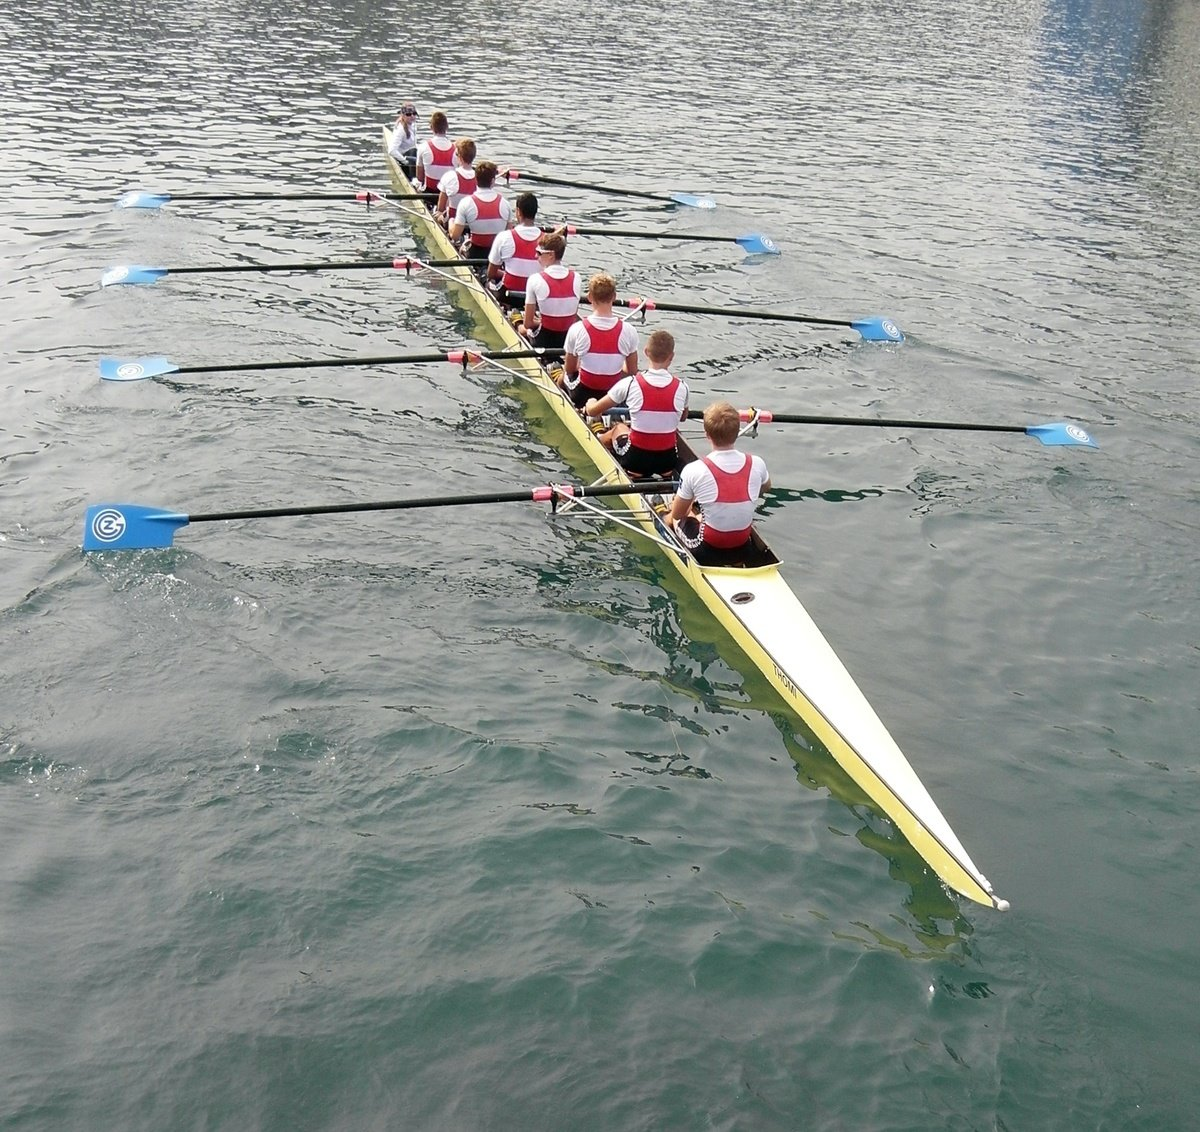 холодного картинки академических лодок секонд-хенде